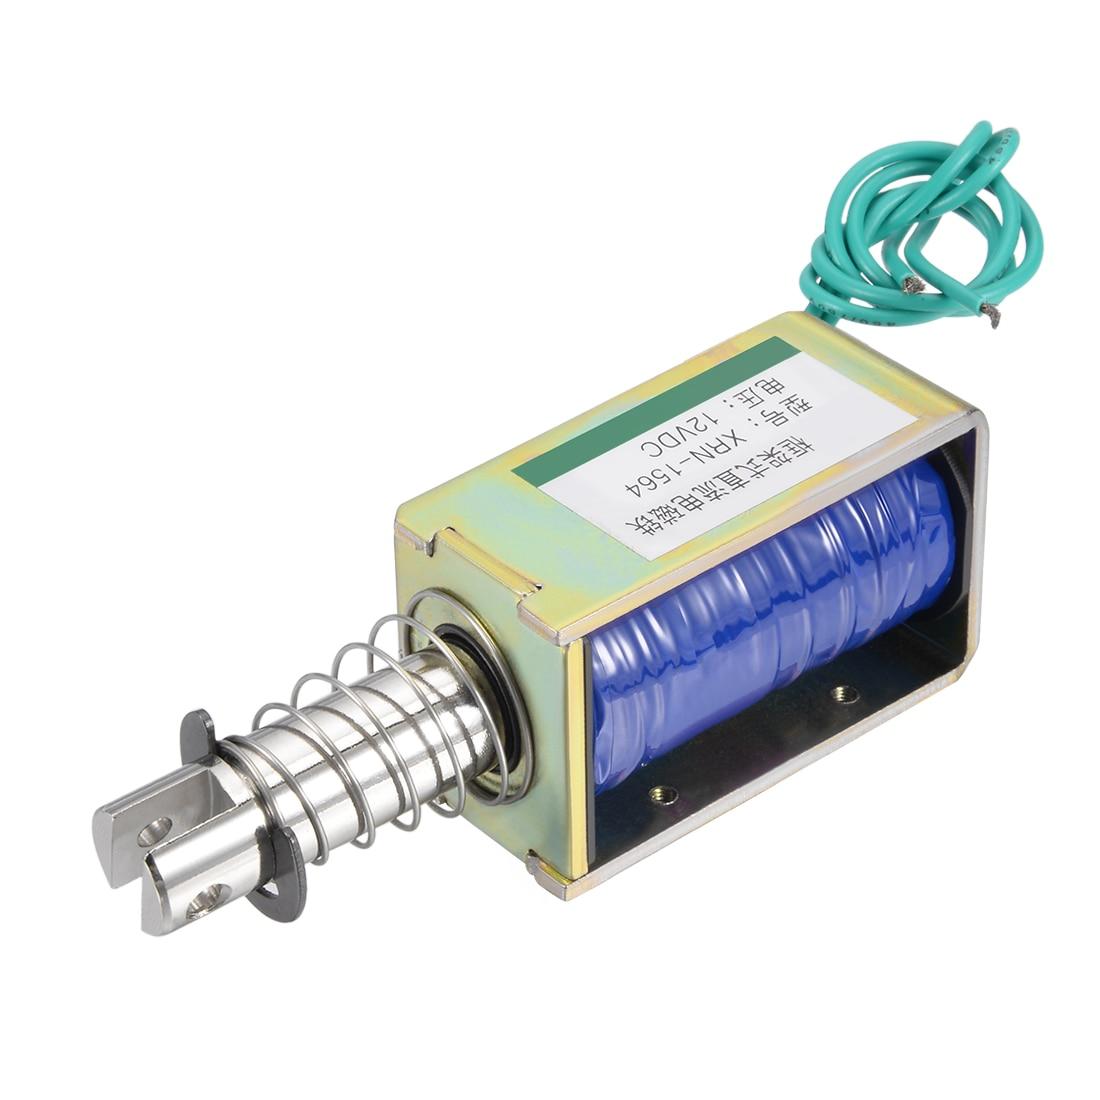 Uxcell XRN-1564 DC 12V 60N 10mm Pull Type Open Frame Solenoid Electromagnet